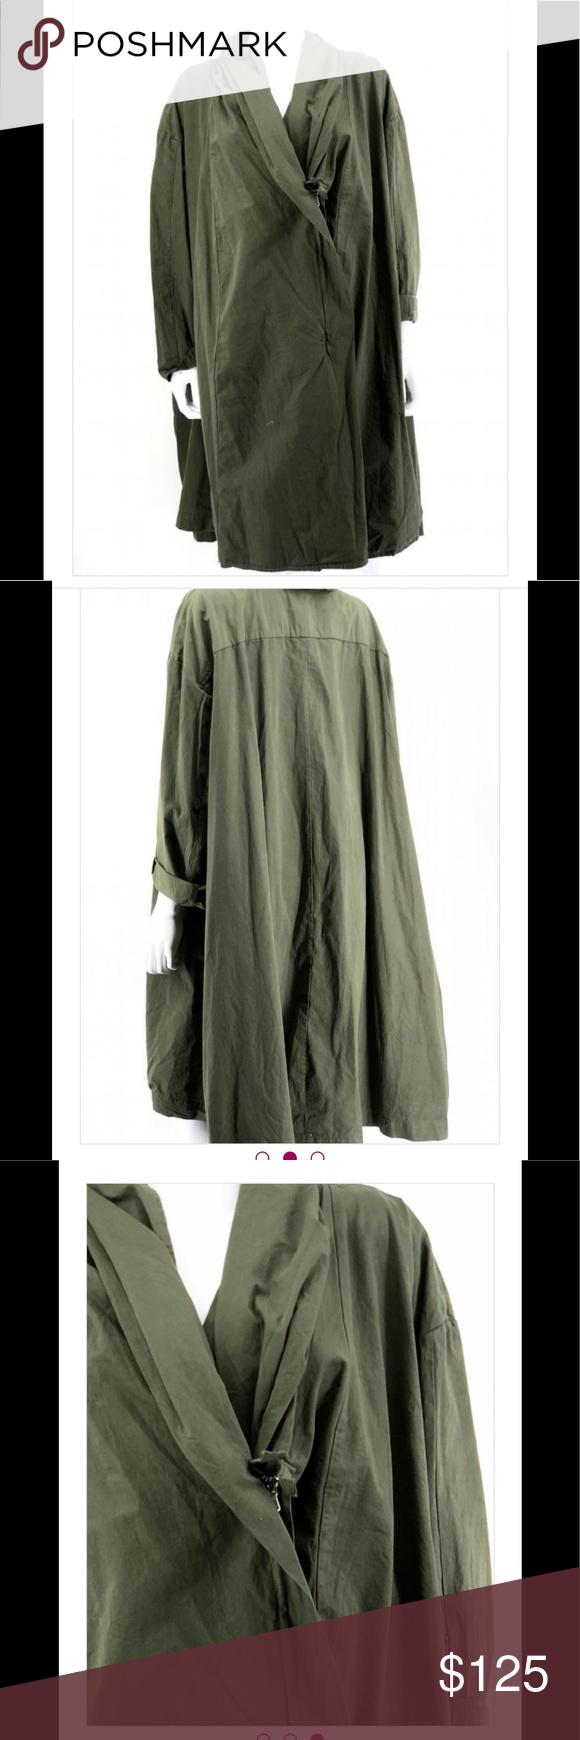 Wendy Trendy Italian Collection Trendy Jackets Trendy Trendy Greens